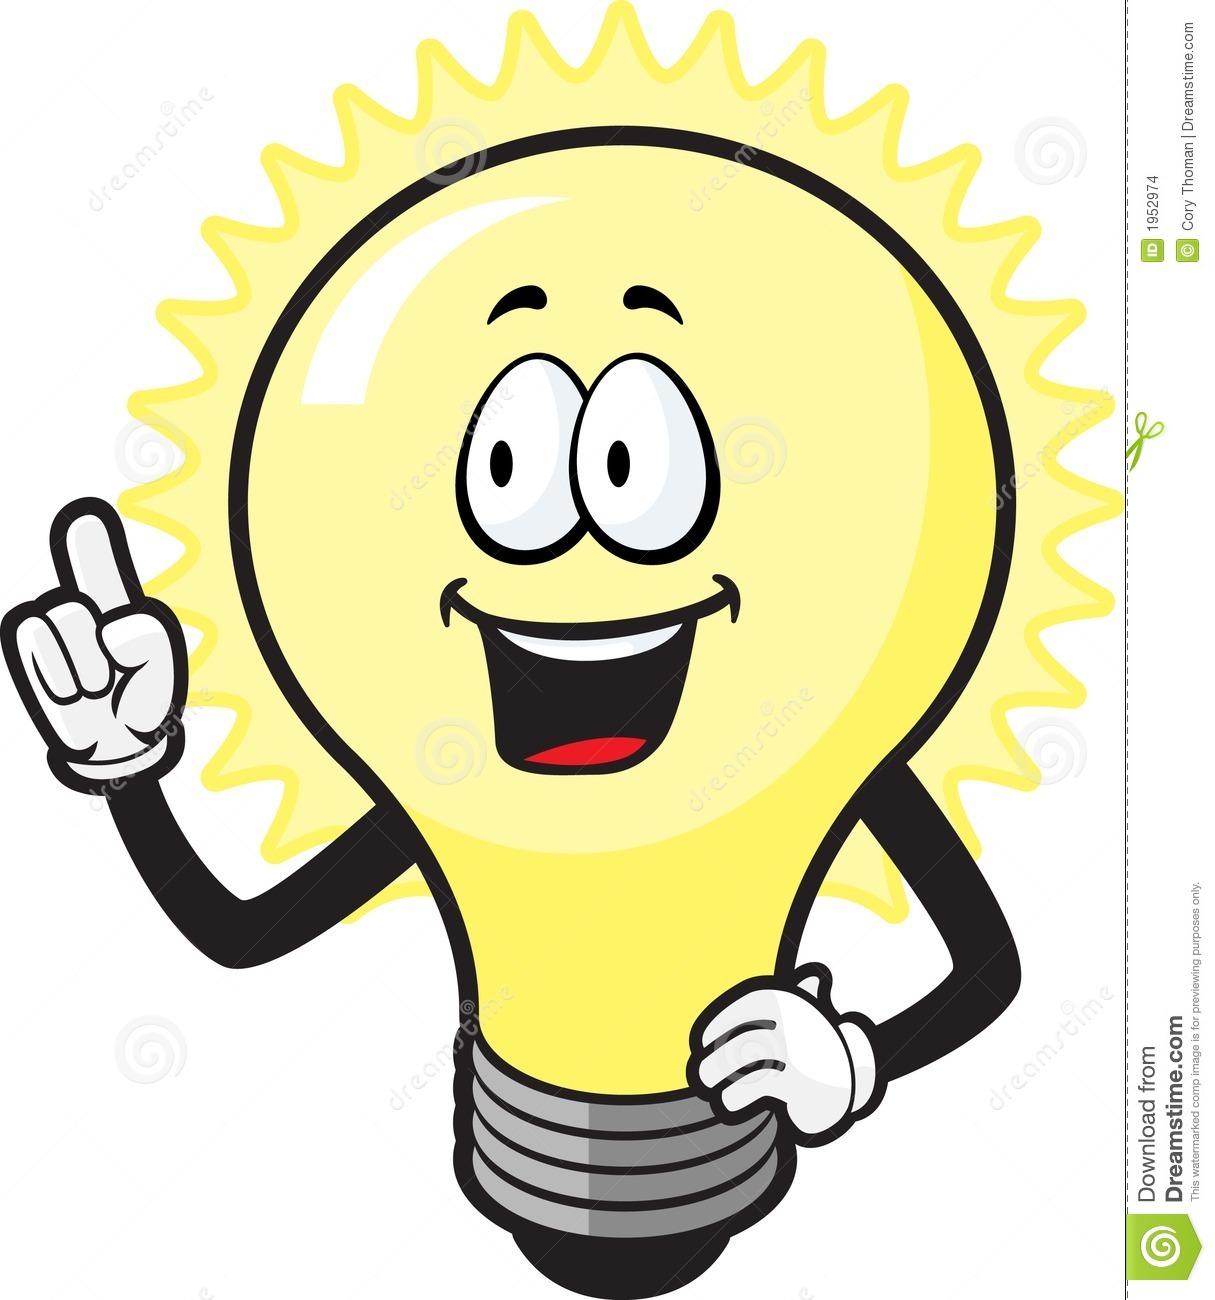 Lightbulb clipart. Thinking light bulb clip